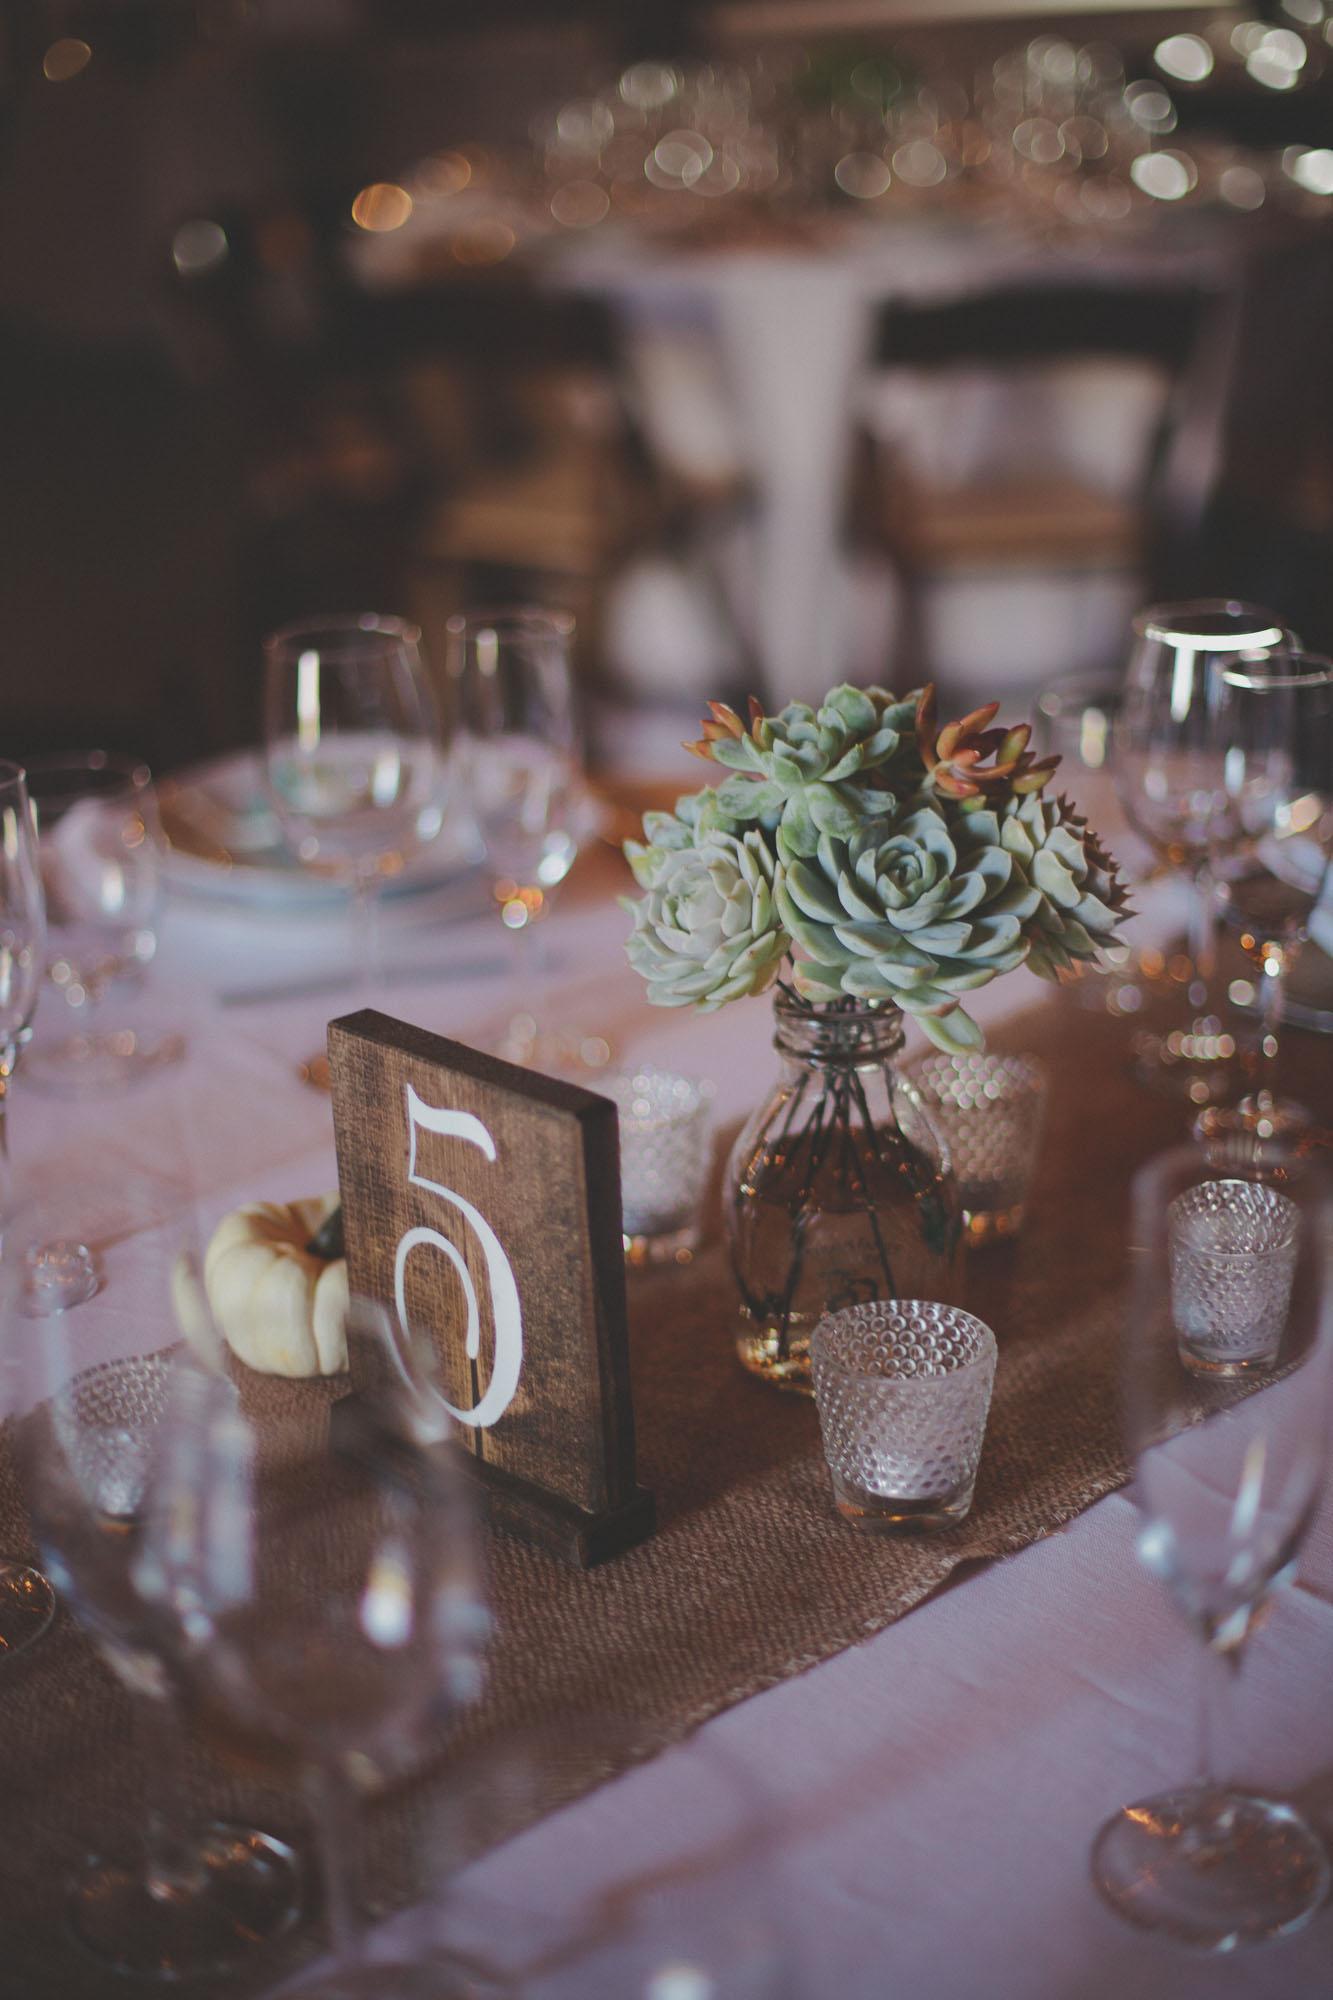 Gretchen_Gause_Petaluma_Olympias_Valley_Wedding_Photo-145.jpg